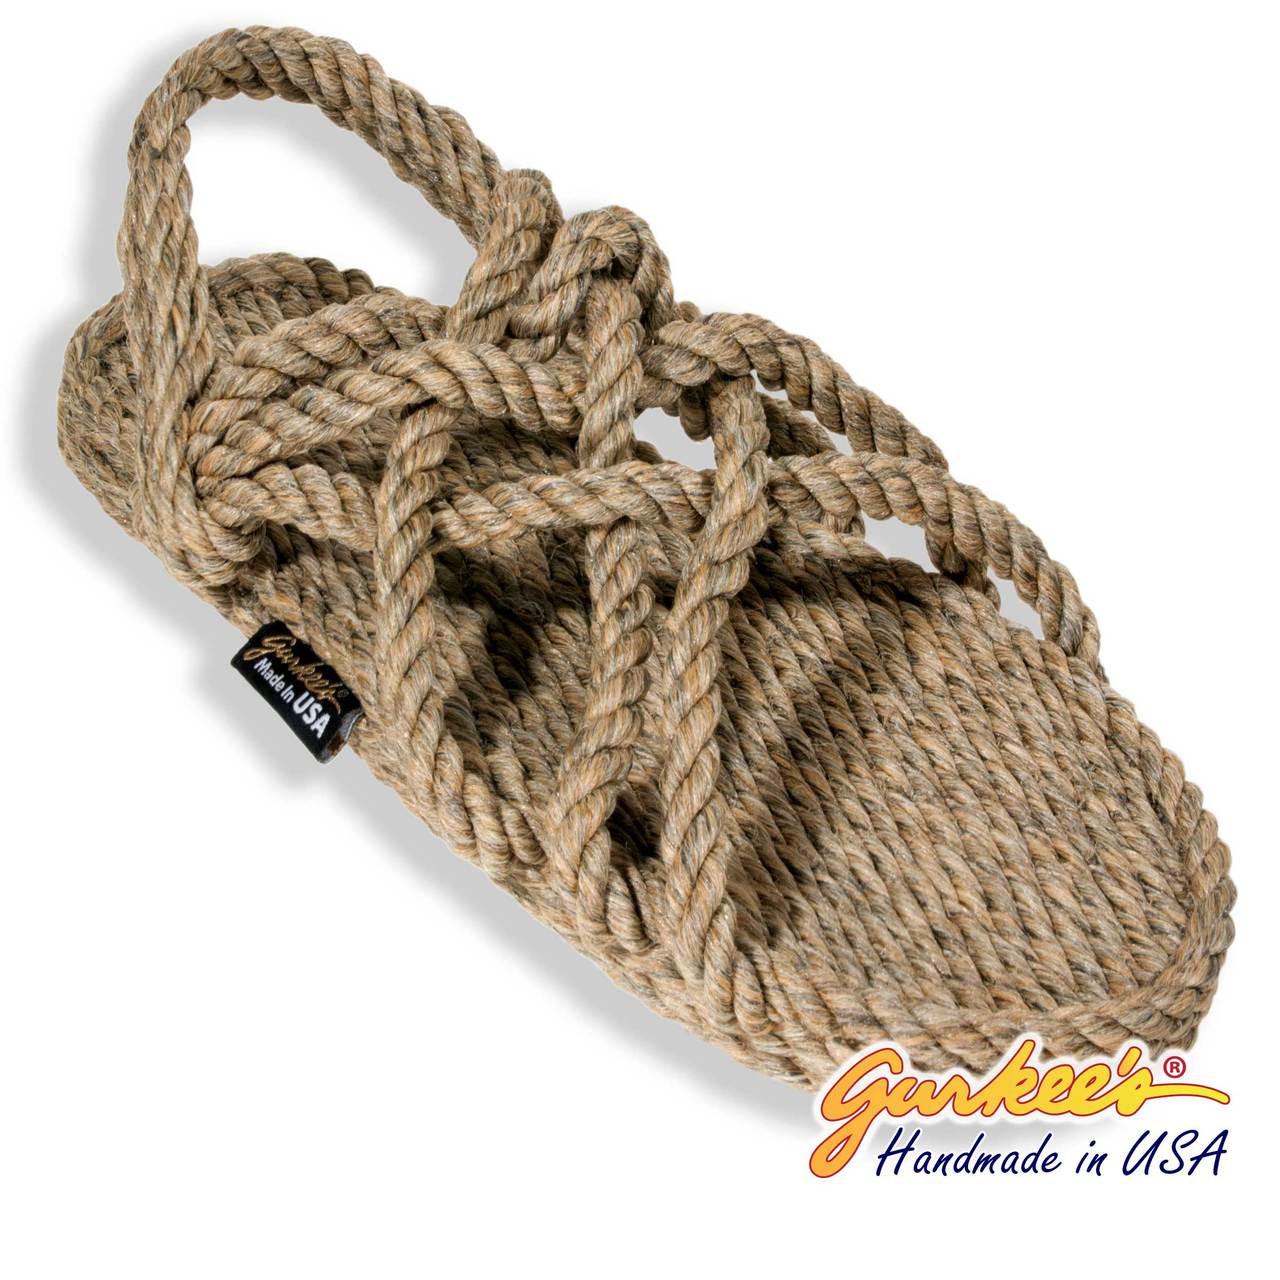 92de46d2baca Signature Neptune Hemp Color Rope Sandals - Gurkee s